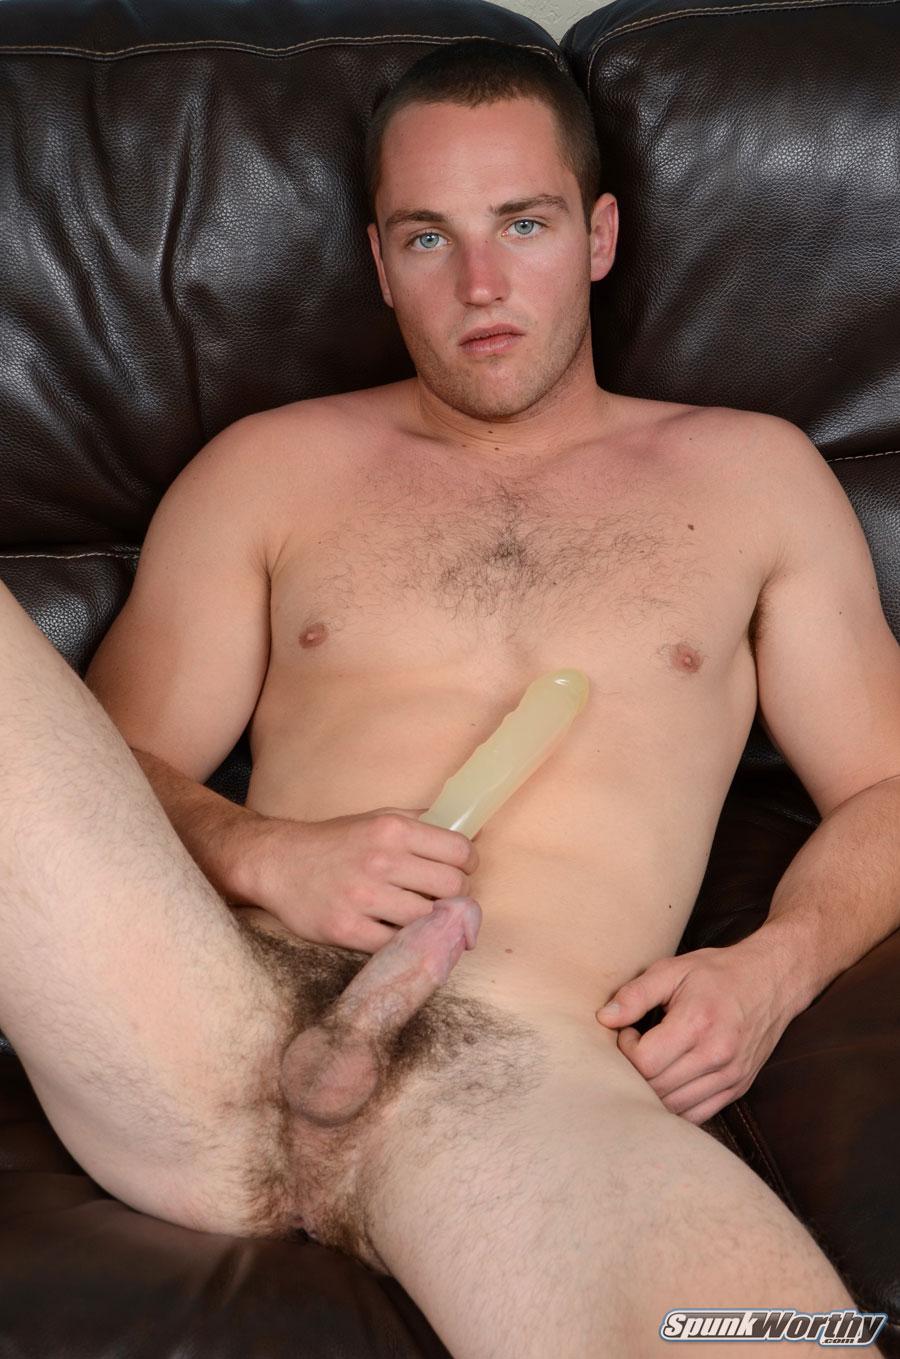 SpunkWorthy Dean Straight Marine Uses A Dildo On Hairy Ass Amateur Gay Porn 03 Ripped Marine Fucks His Striaght Hairy Ass With A Dildo